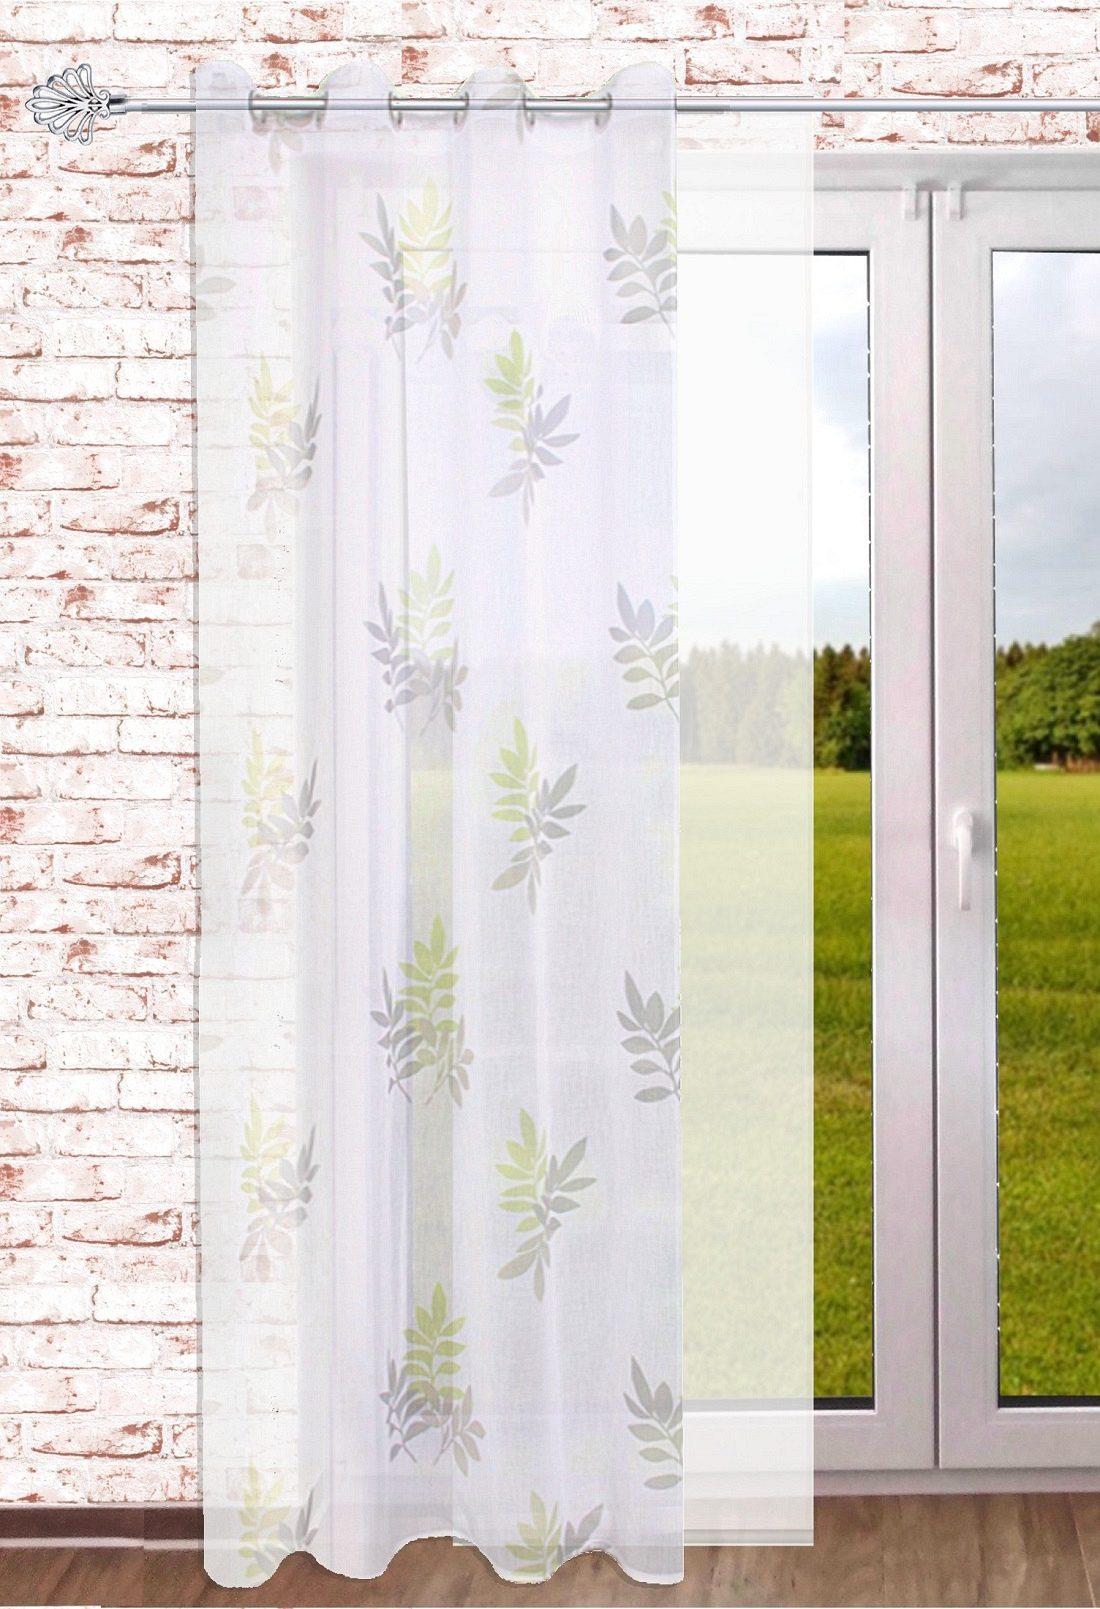 gardinen welt online shop transparenter senschal blatt 140 x 245 cm gardinenschal mit sen. Black Bedroom Furniture Sets. Home Design Ideas